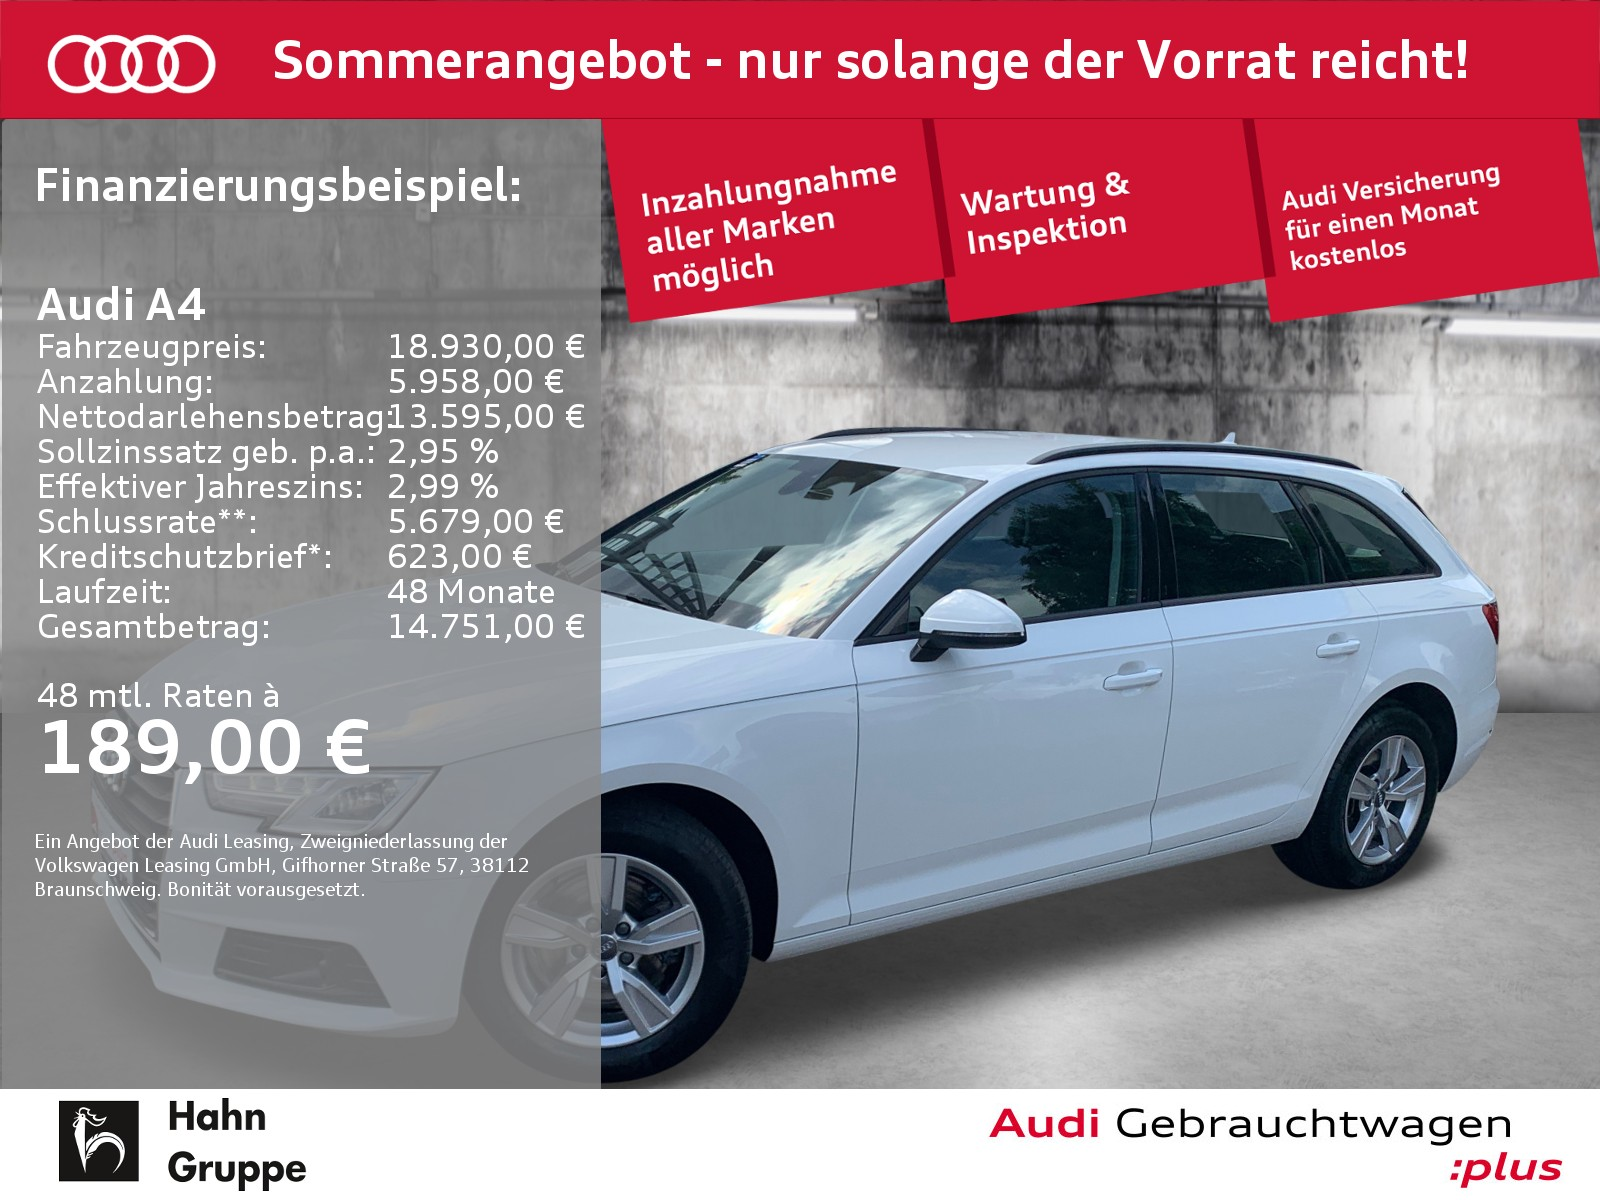 Audi A4 Avant 2.0TDI S-trc Navi Xen ACC Sitzh Einpark, Jahr 2017, Diesel